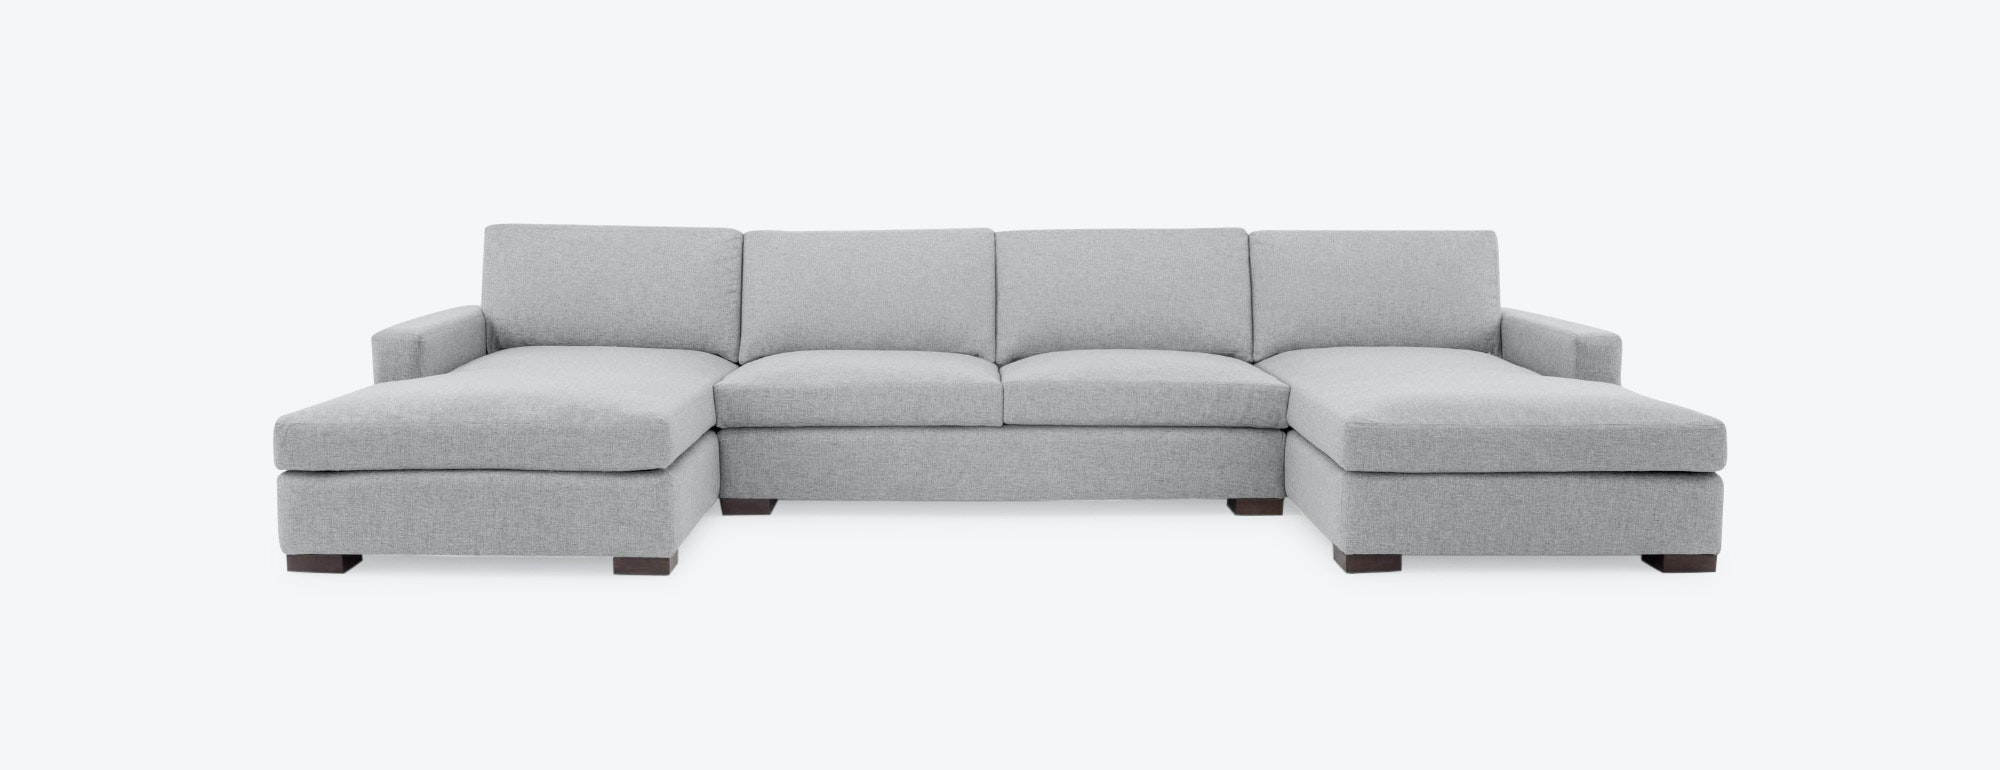 Anton U Chaise Sectional Joybird ~ One Arm Sofa With Chaise